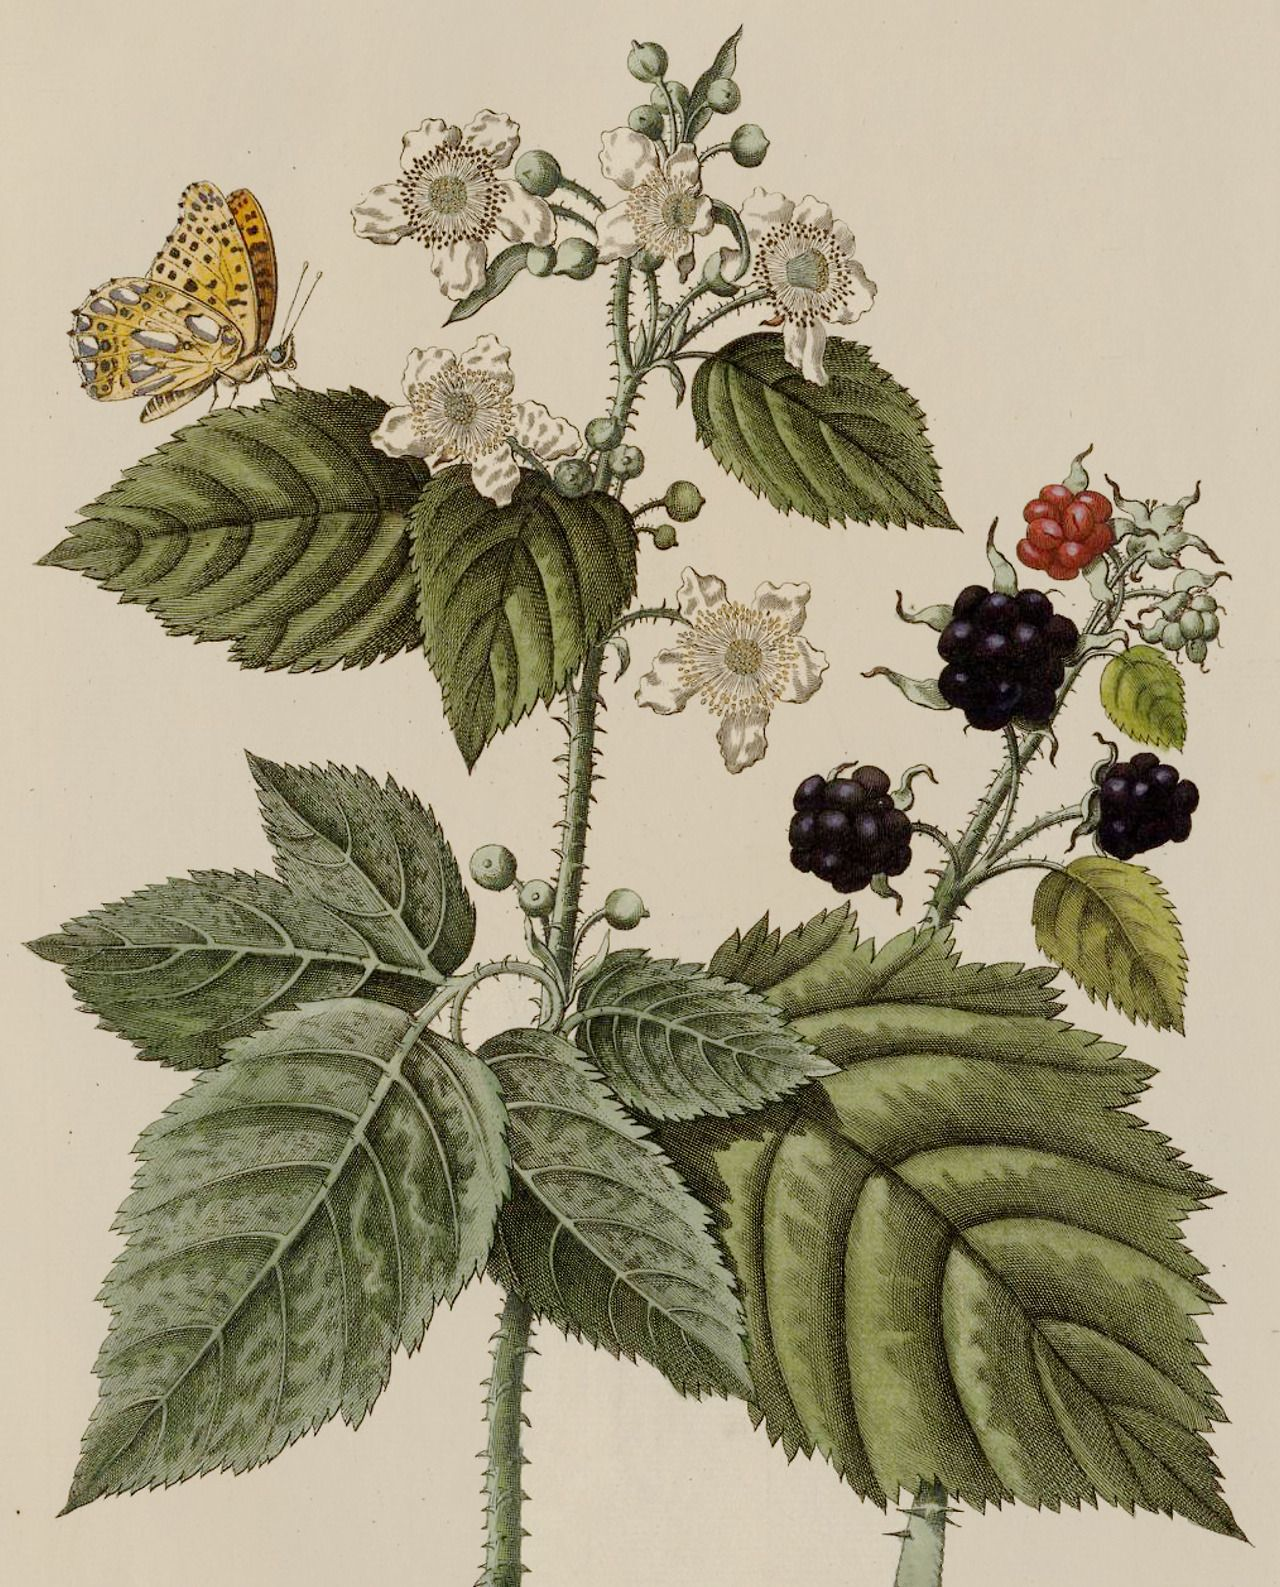 Clawmarks: Icones Plantarvm - Casimir Christoph Schmidel - 1747 - via e-rara - #Casimir #Christoph #clawmarks: #e-rara #Icones #Plantarvm #Schmidel